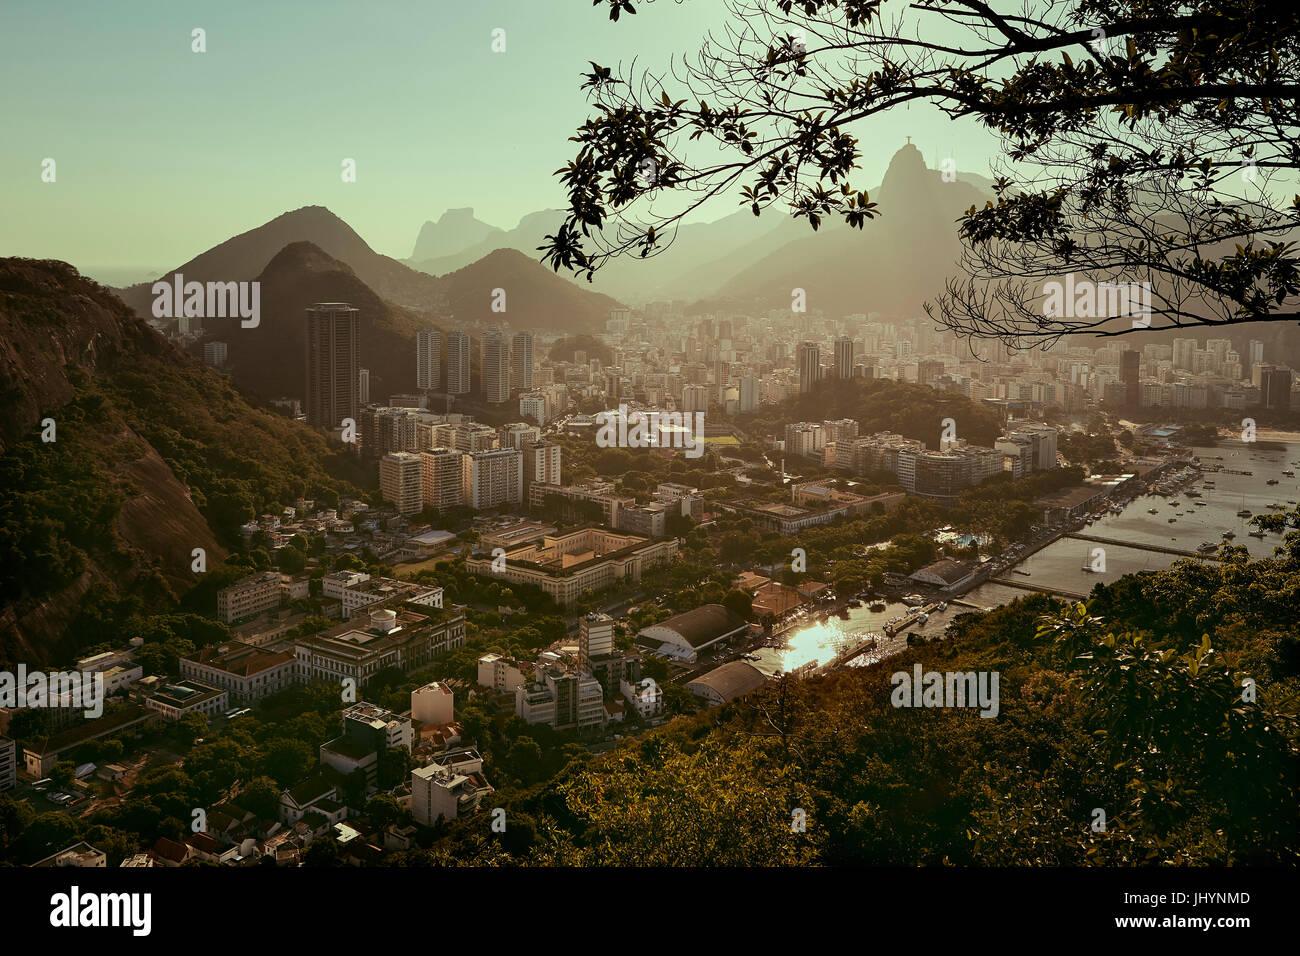 Views of Rio de Janeiro and Christ the Redeemer from Sugarloaf mountain (Pao de Acuca) at sunset, Rio de Janeiro, - Stock Image